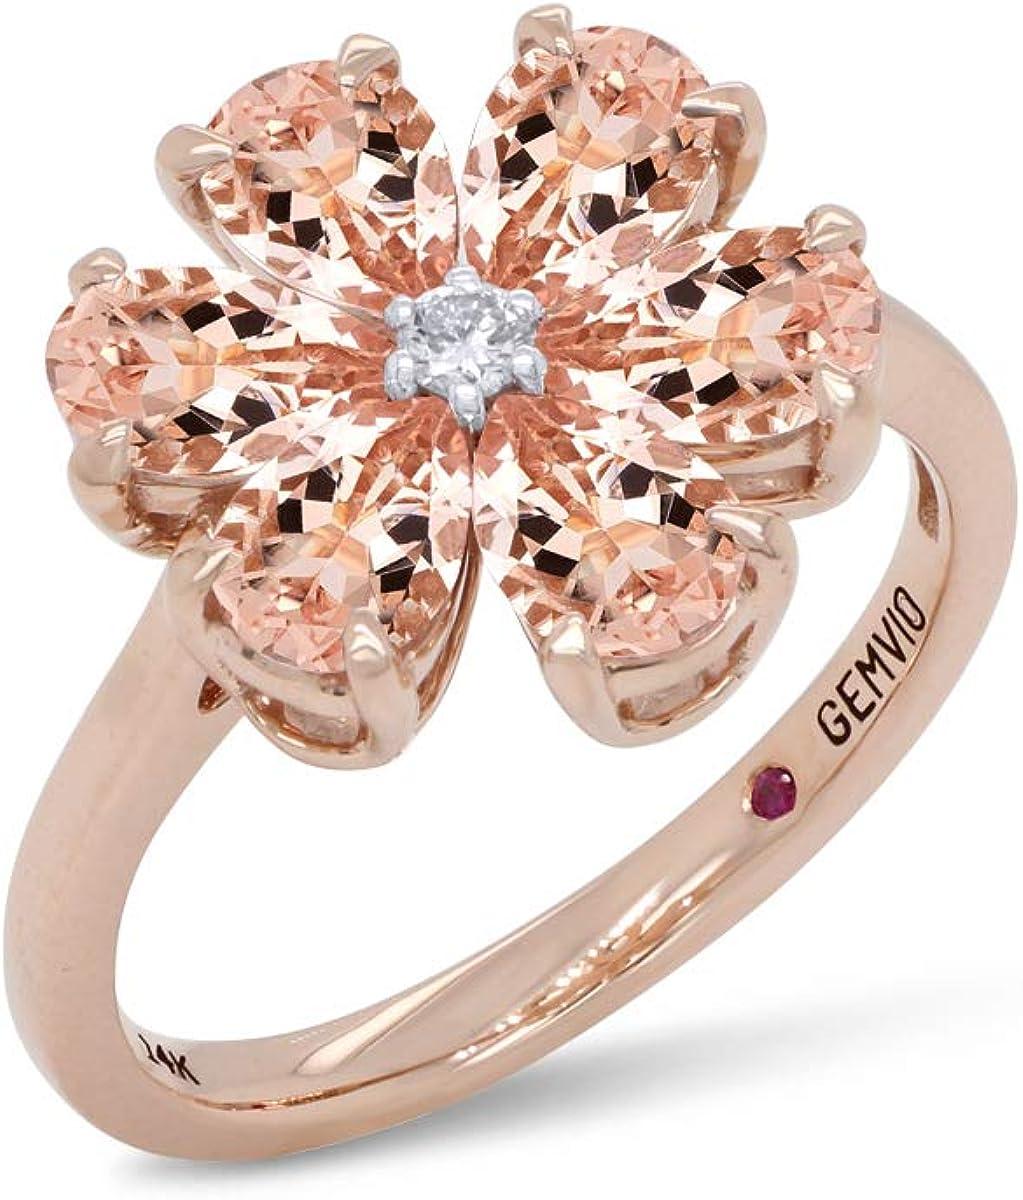 GEMVIO COLLECTION 1.45 Carat (Ctw) Botanical Flower Design, Pear 6X4MM Peach Morganite Gemstone & Diamond Accent In 14k Gold Enagagement Anniversary Wedding Ring For Womens Birthday